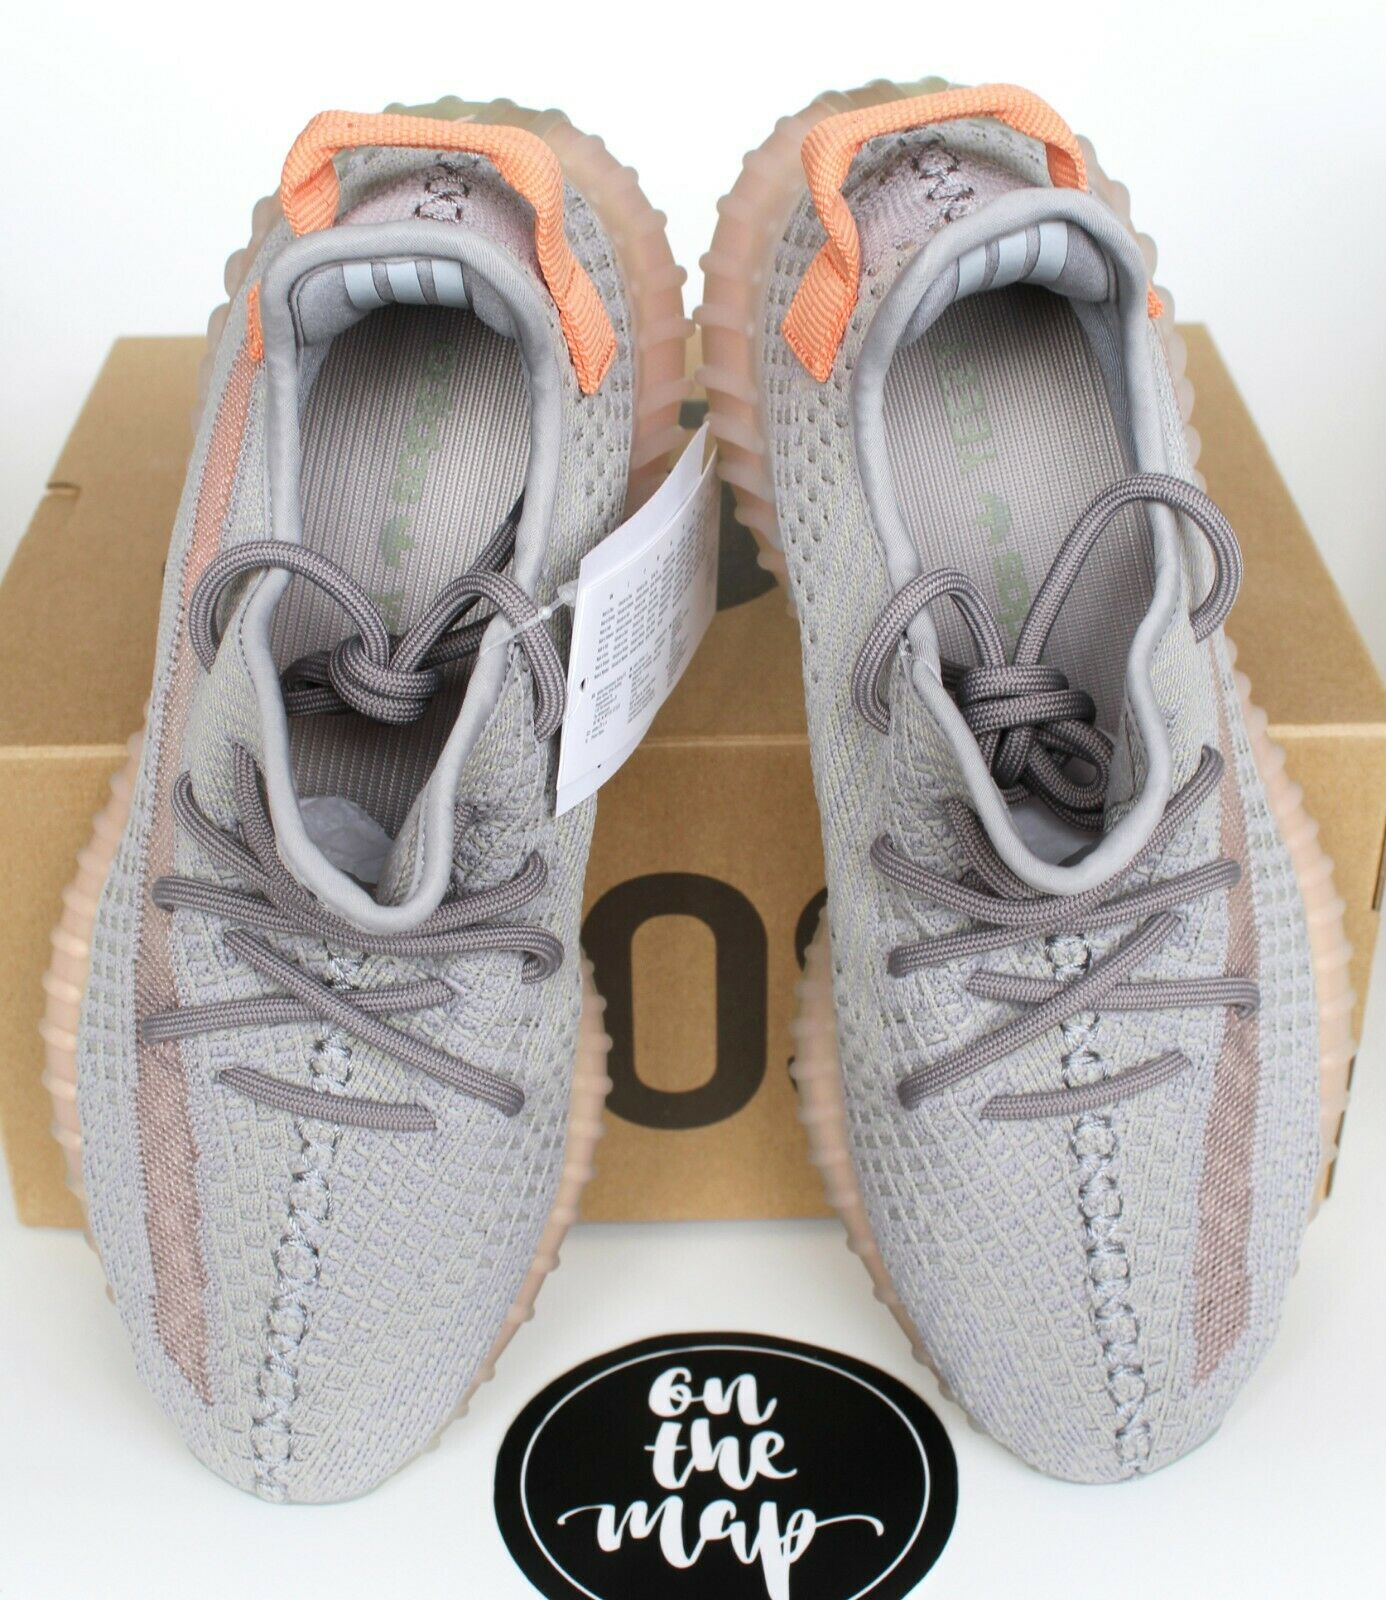 Adidas Yeezy Boost 350 350 350 V2 Vero UK Argilla Grigio Form 3 4 5 6 7 8 9 10 11 12 13 NUOVO 5f8b39